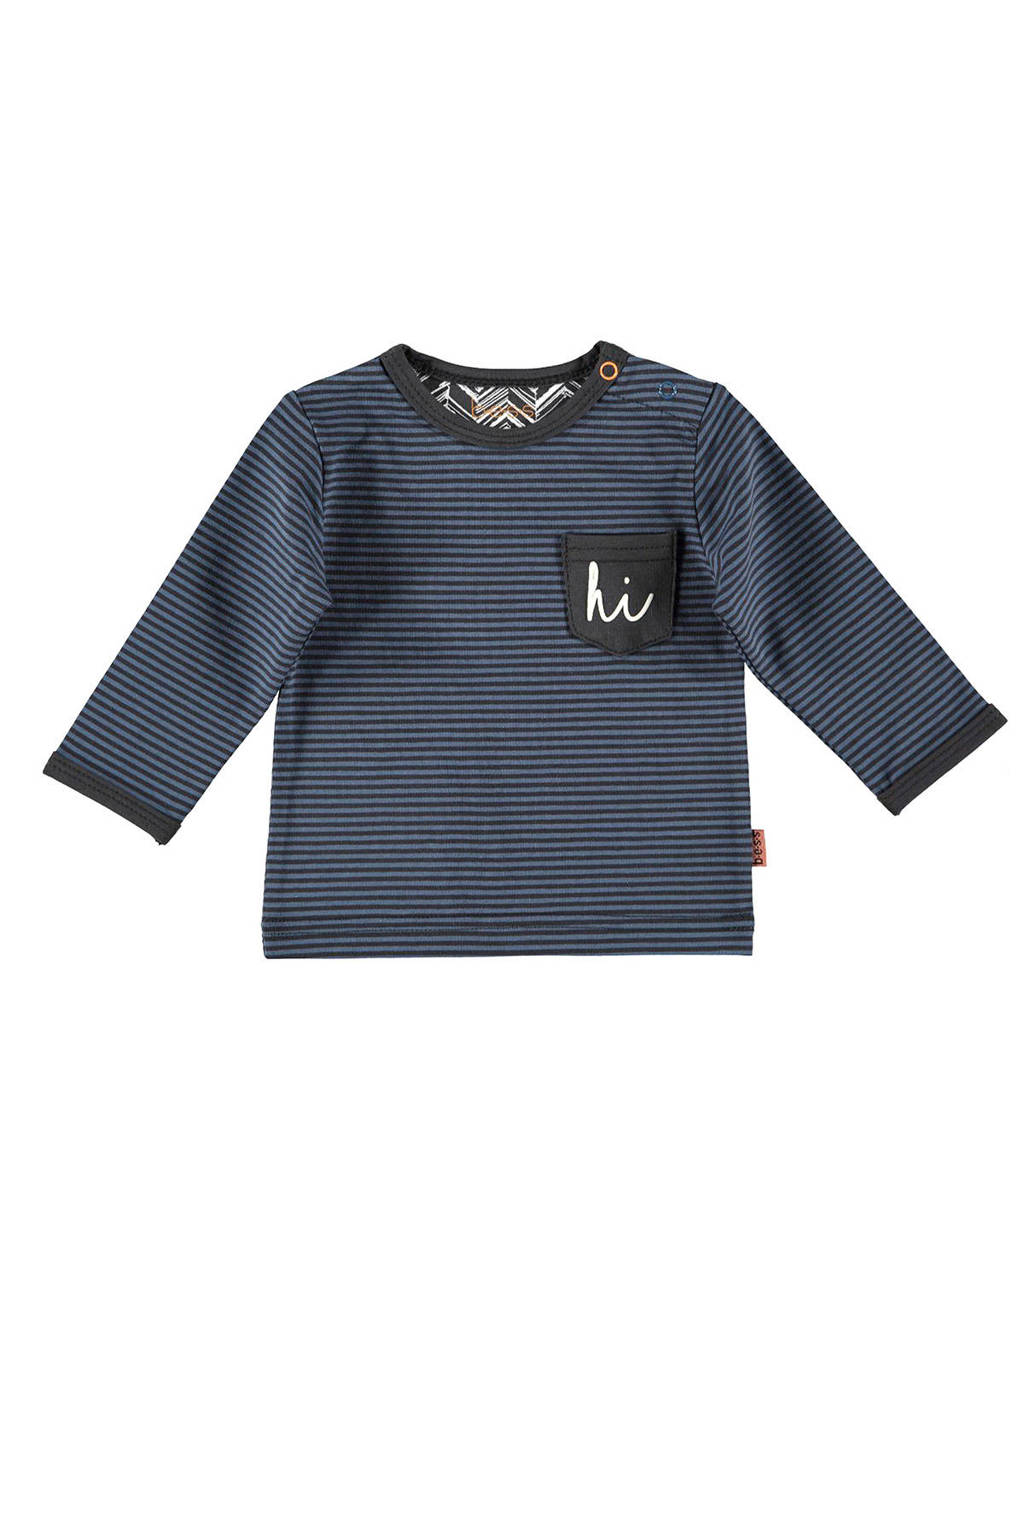 B.E.S.S baby gestreepte longsleeve donkerblauw/zwart, Donkerblauw/zwart